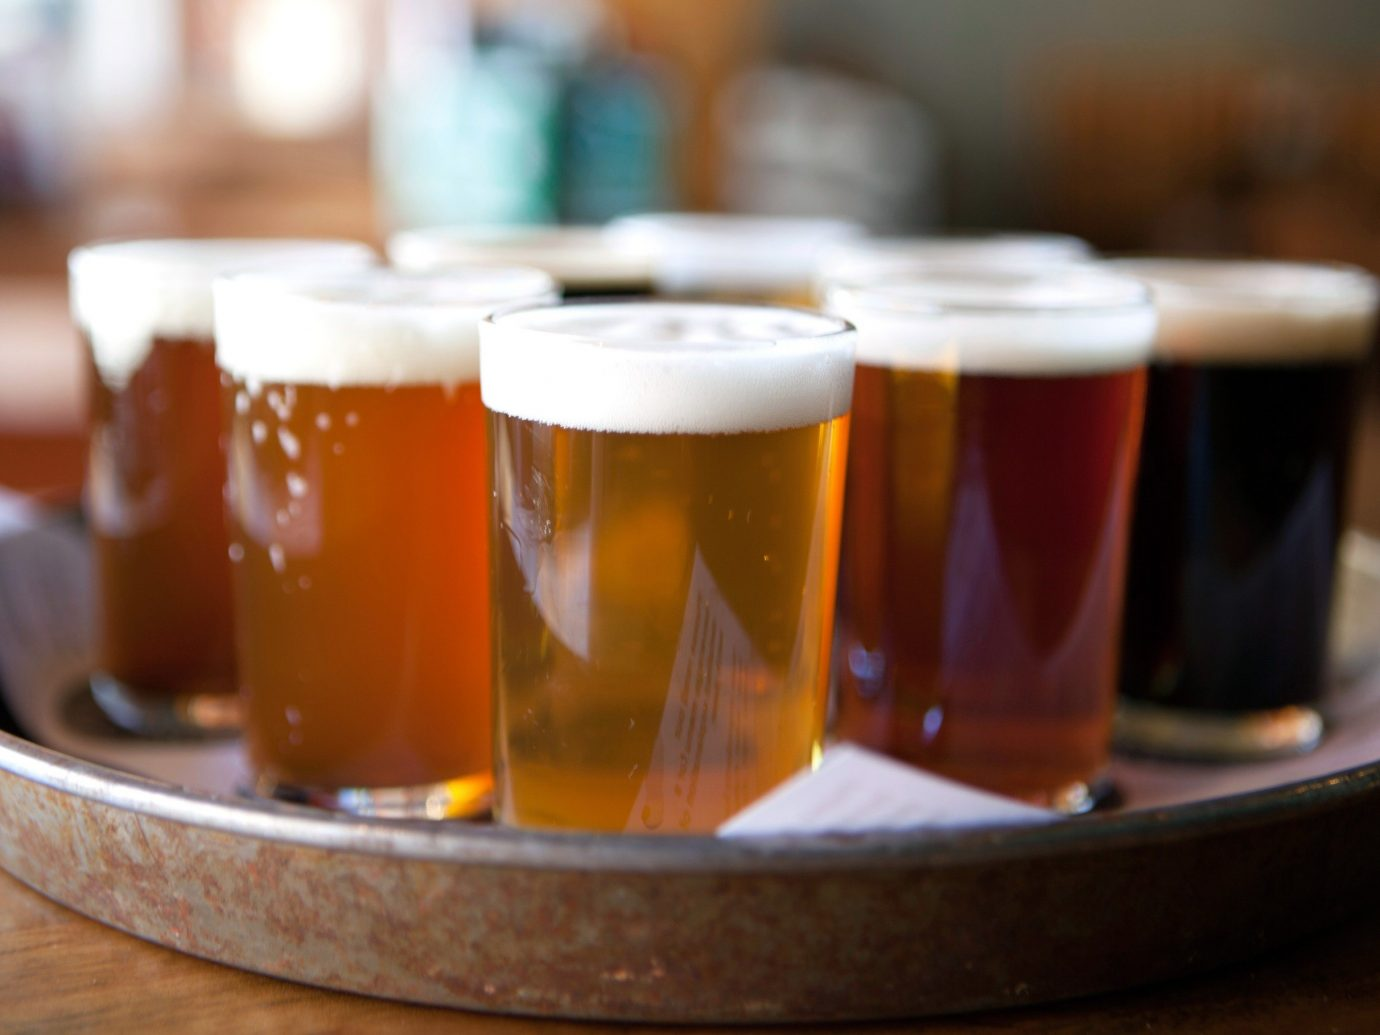 Trip Ideas cup table indoor beer Drink alcoholic beverage distilled beverage